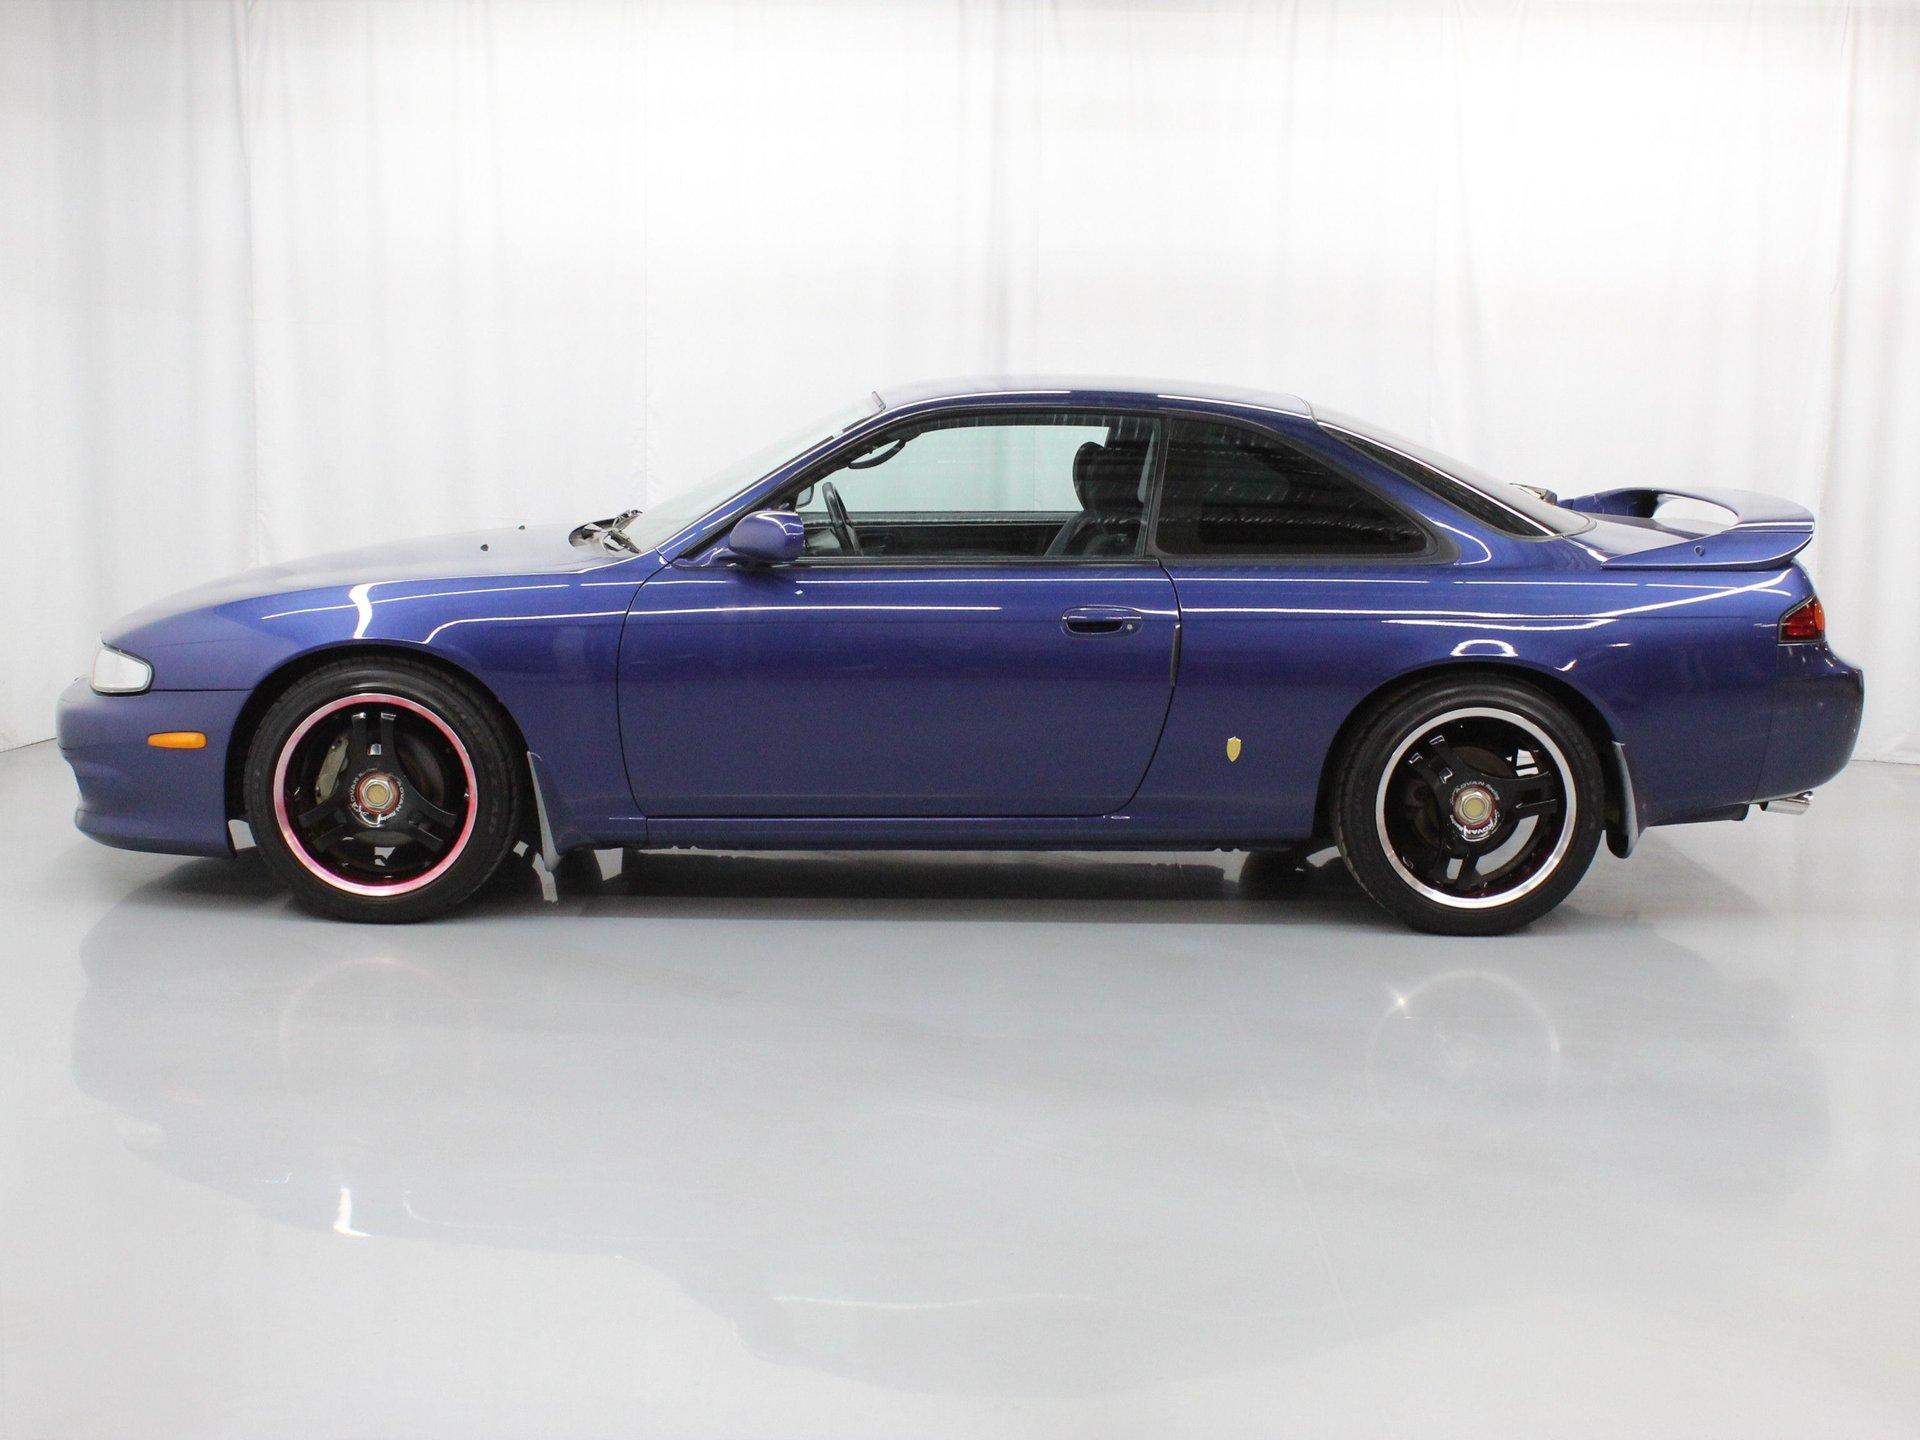 1995 Nissan Silvia